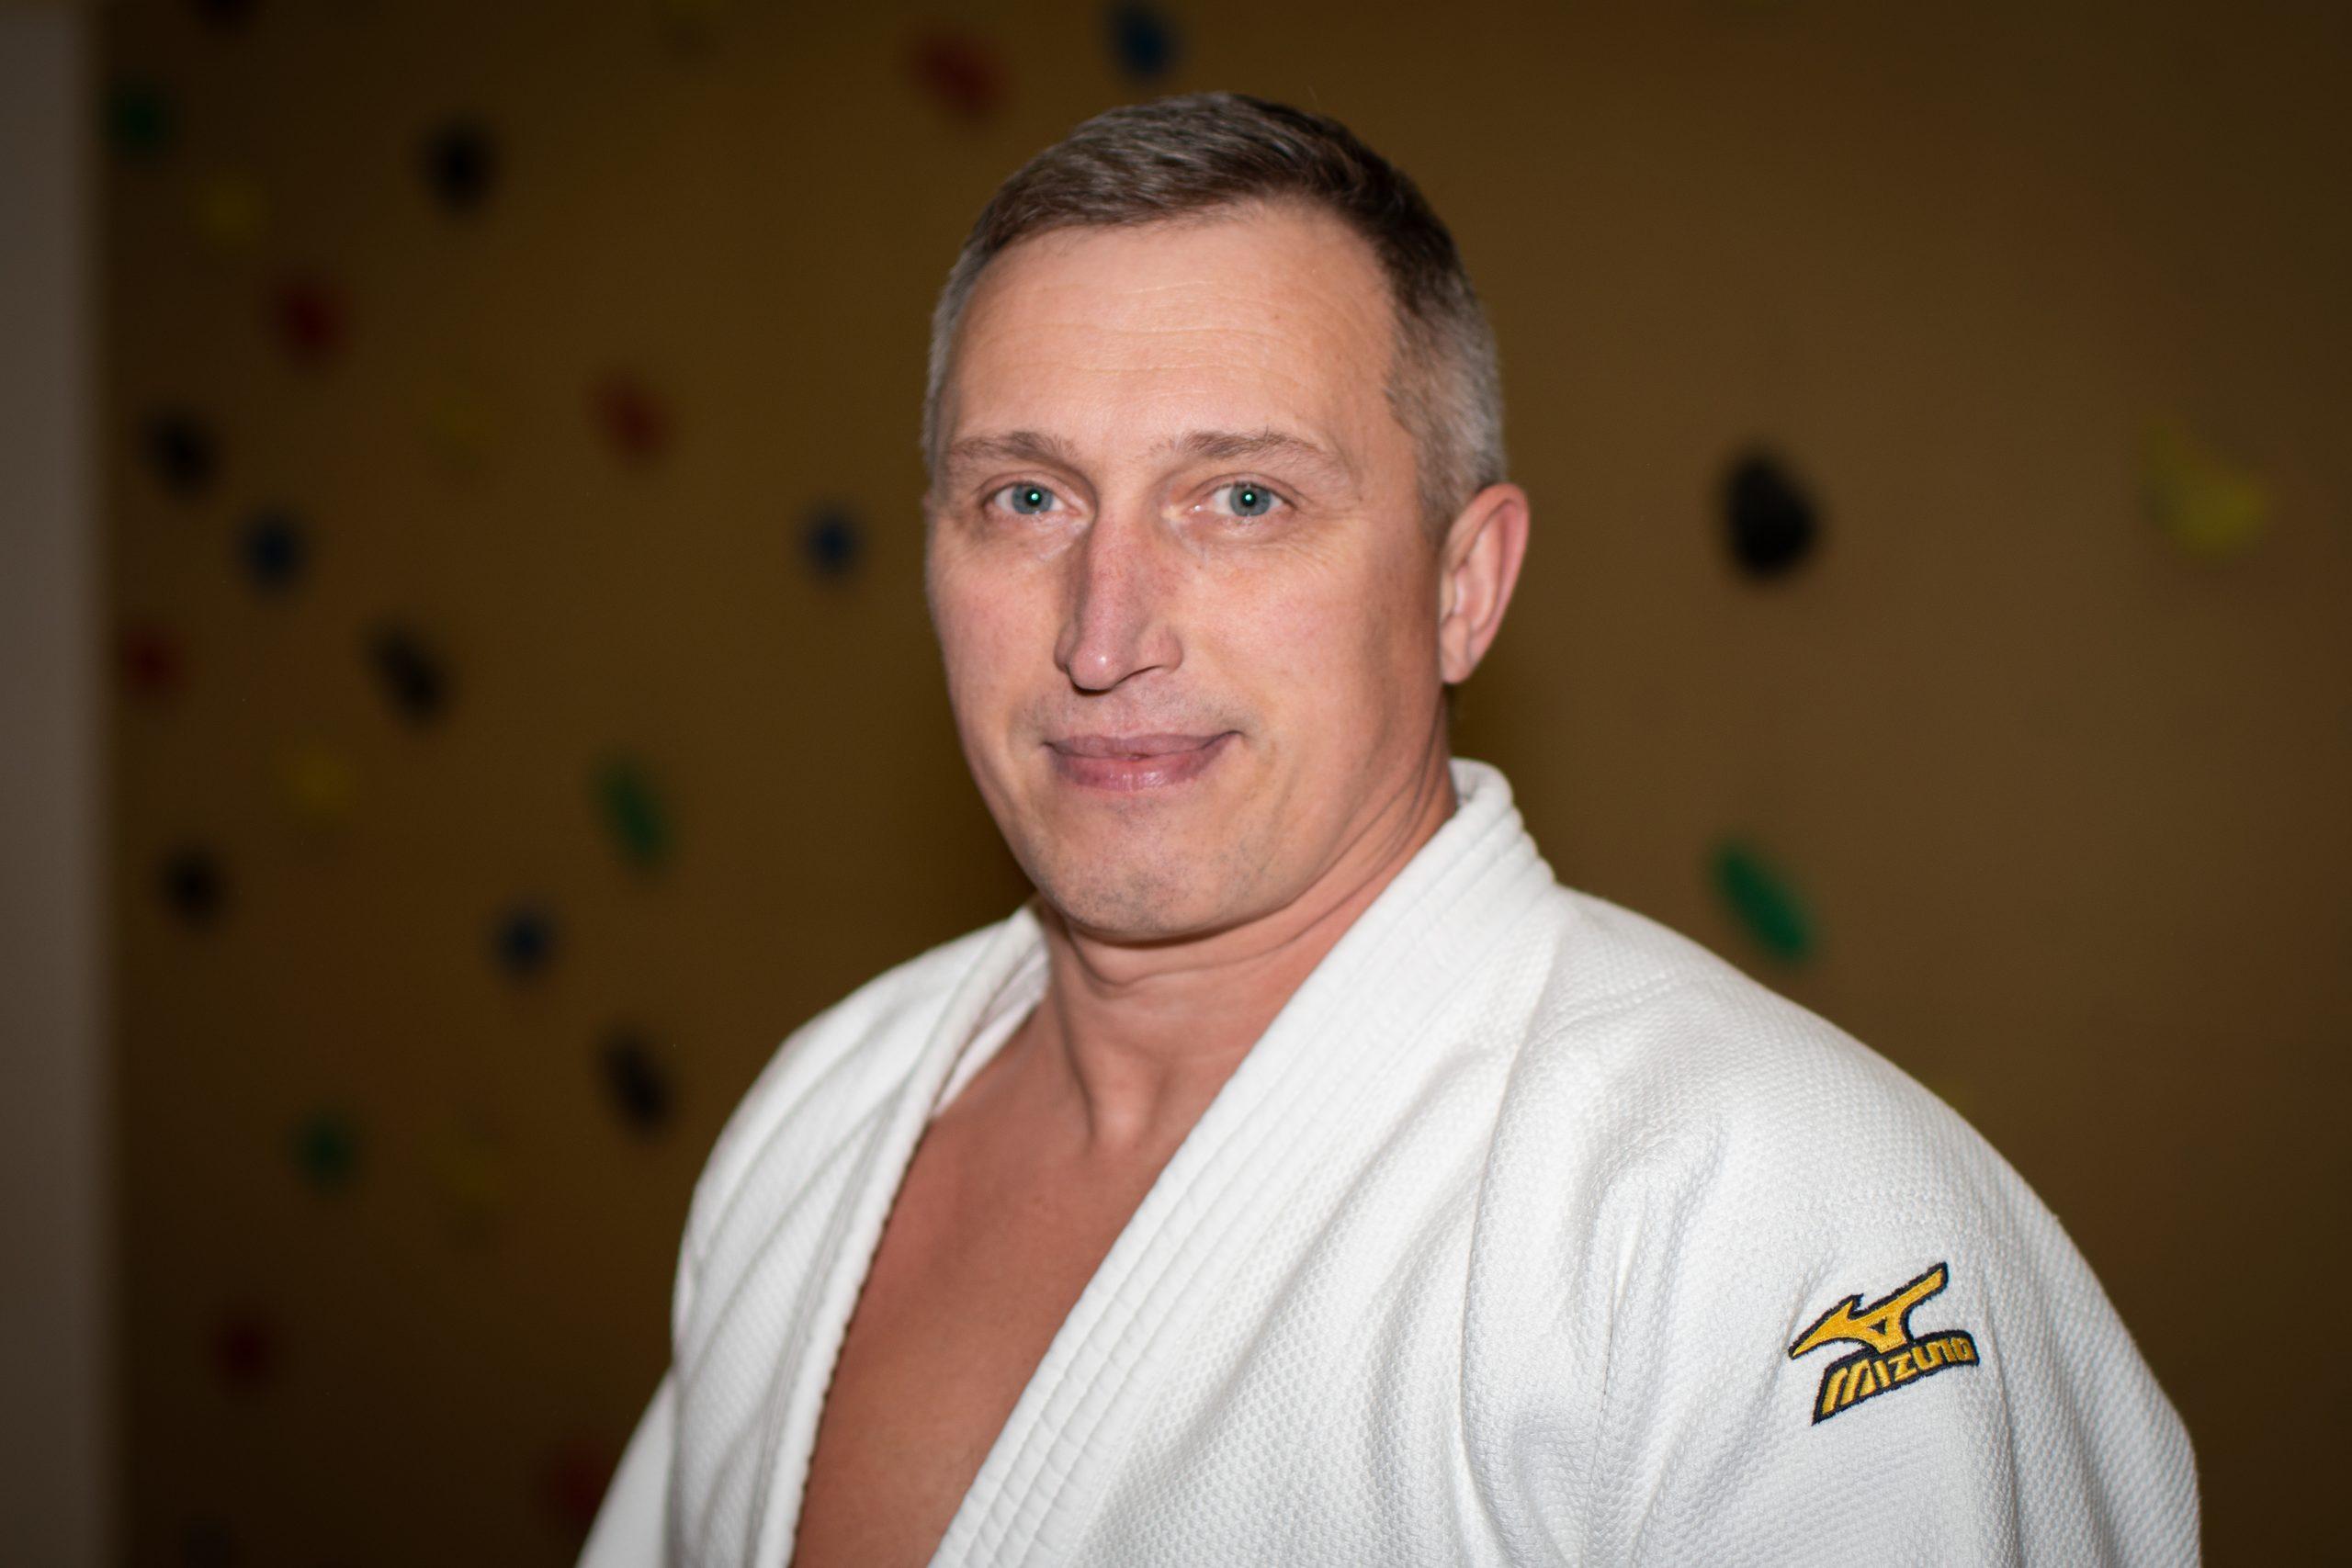 https://vfl-geesthacht.net/wp-content/uploads/2020/04/MF_VFL_Judo_Trainer_Alexander_Krivzov-scaled.jpg